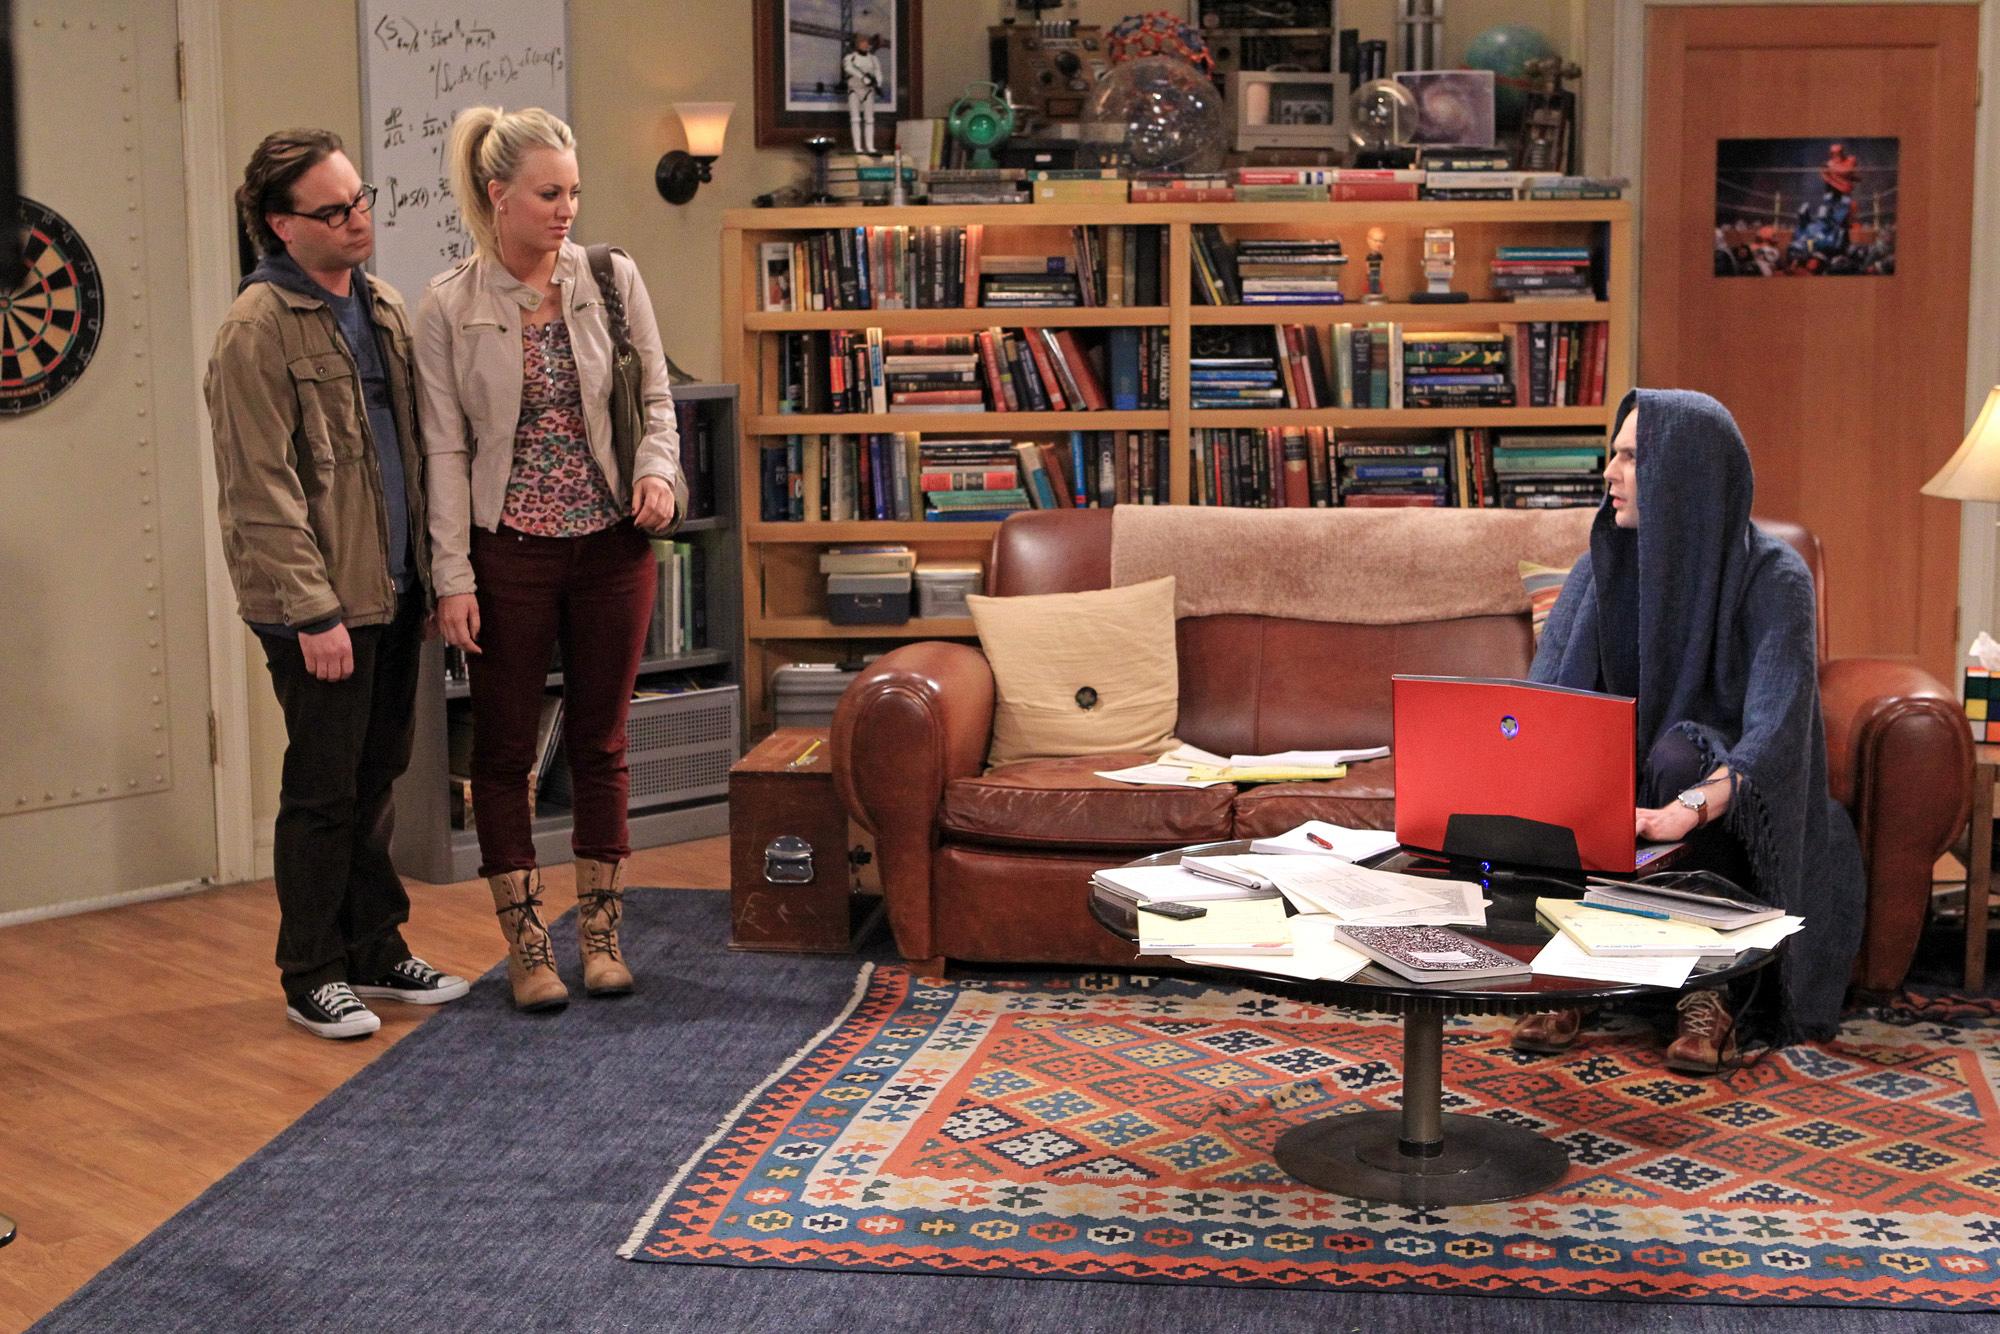 Leonard, Penny & Sheldon